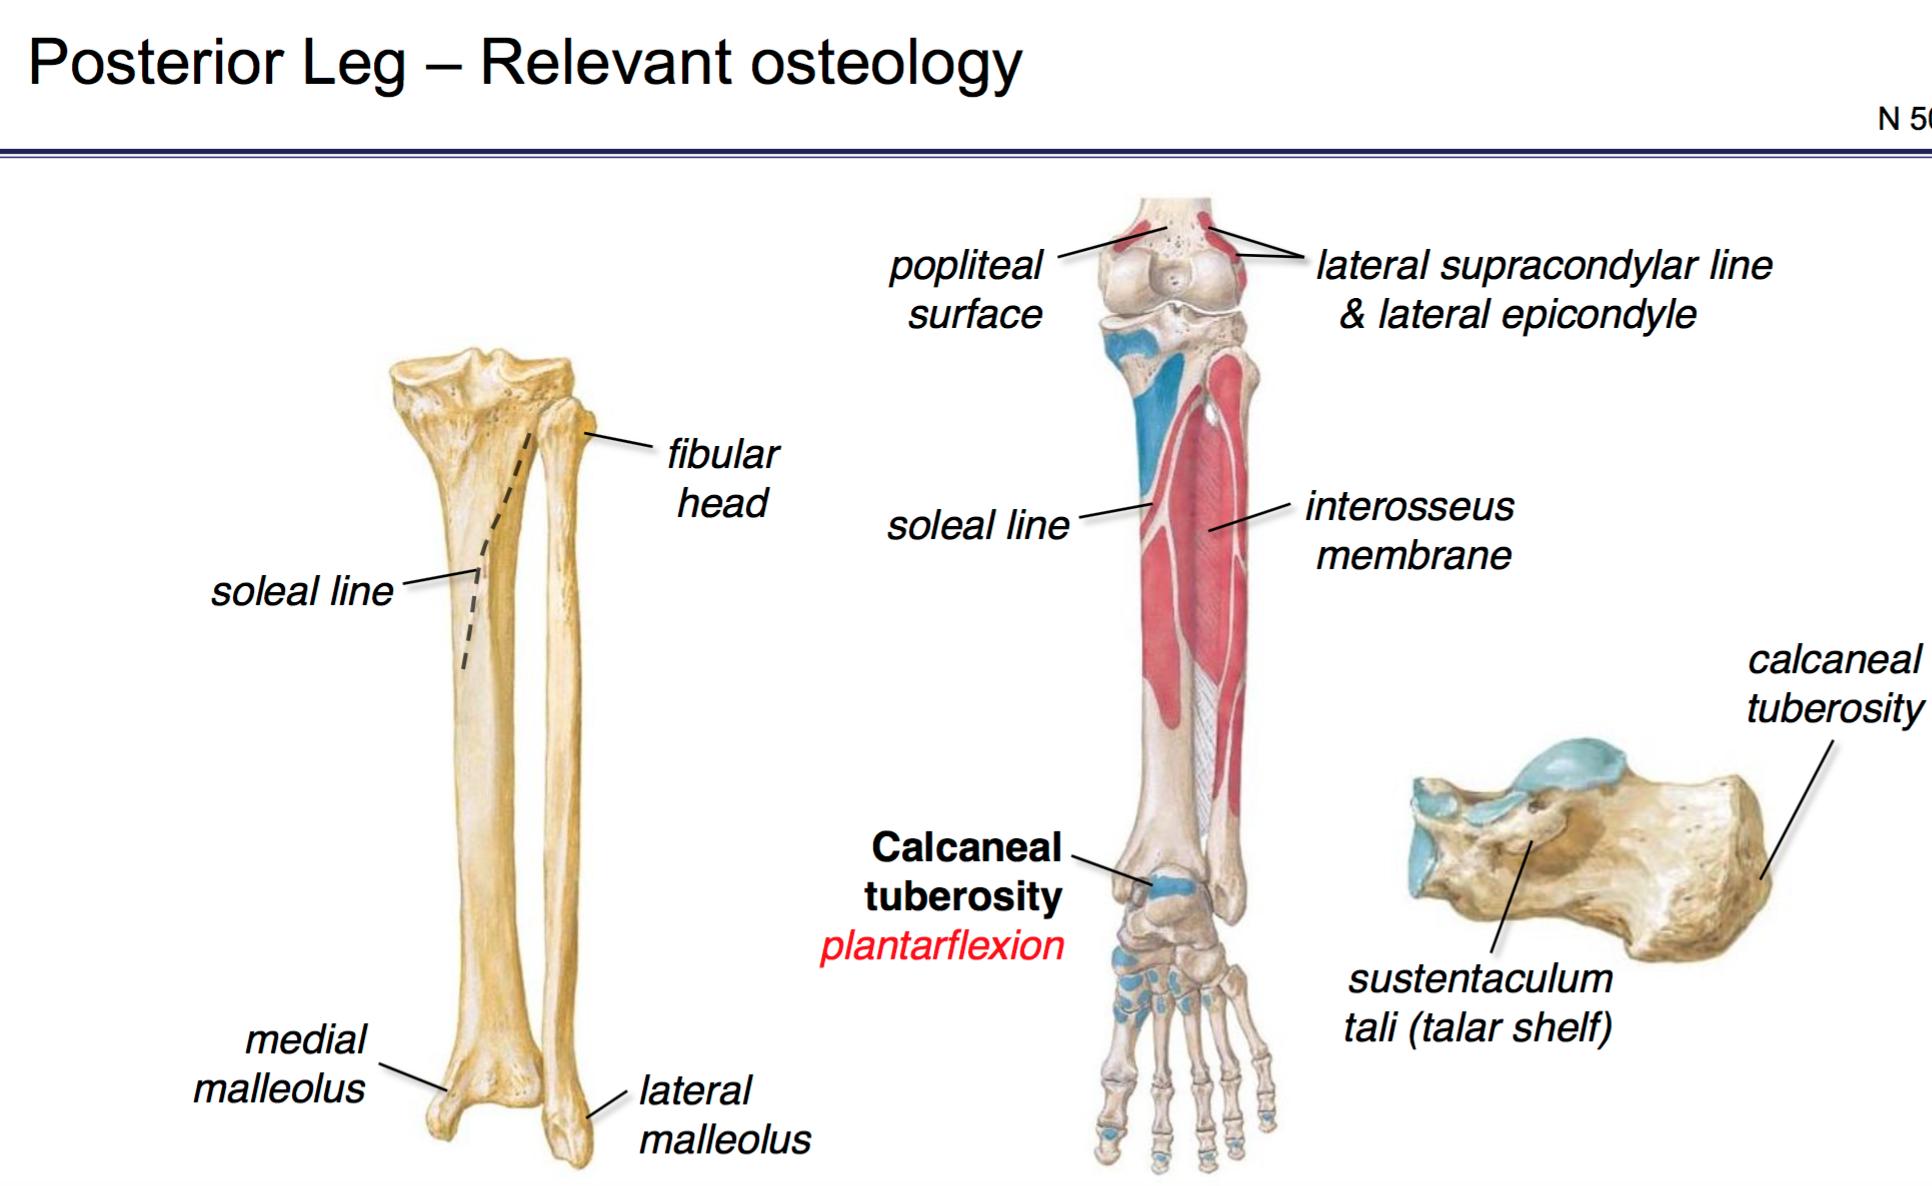 tibia soleal line diagram wiring diagram data todayfg anatomy g46 popliteal fossa \u0026 posterior leg (anatomy unit 6 tibia soleal line diagram